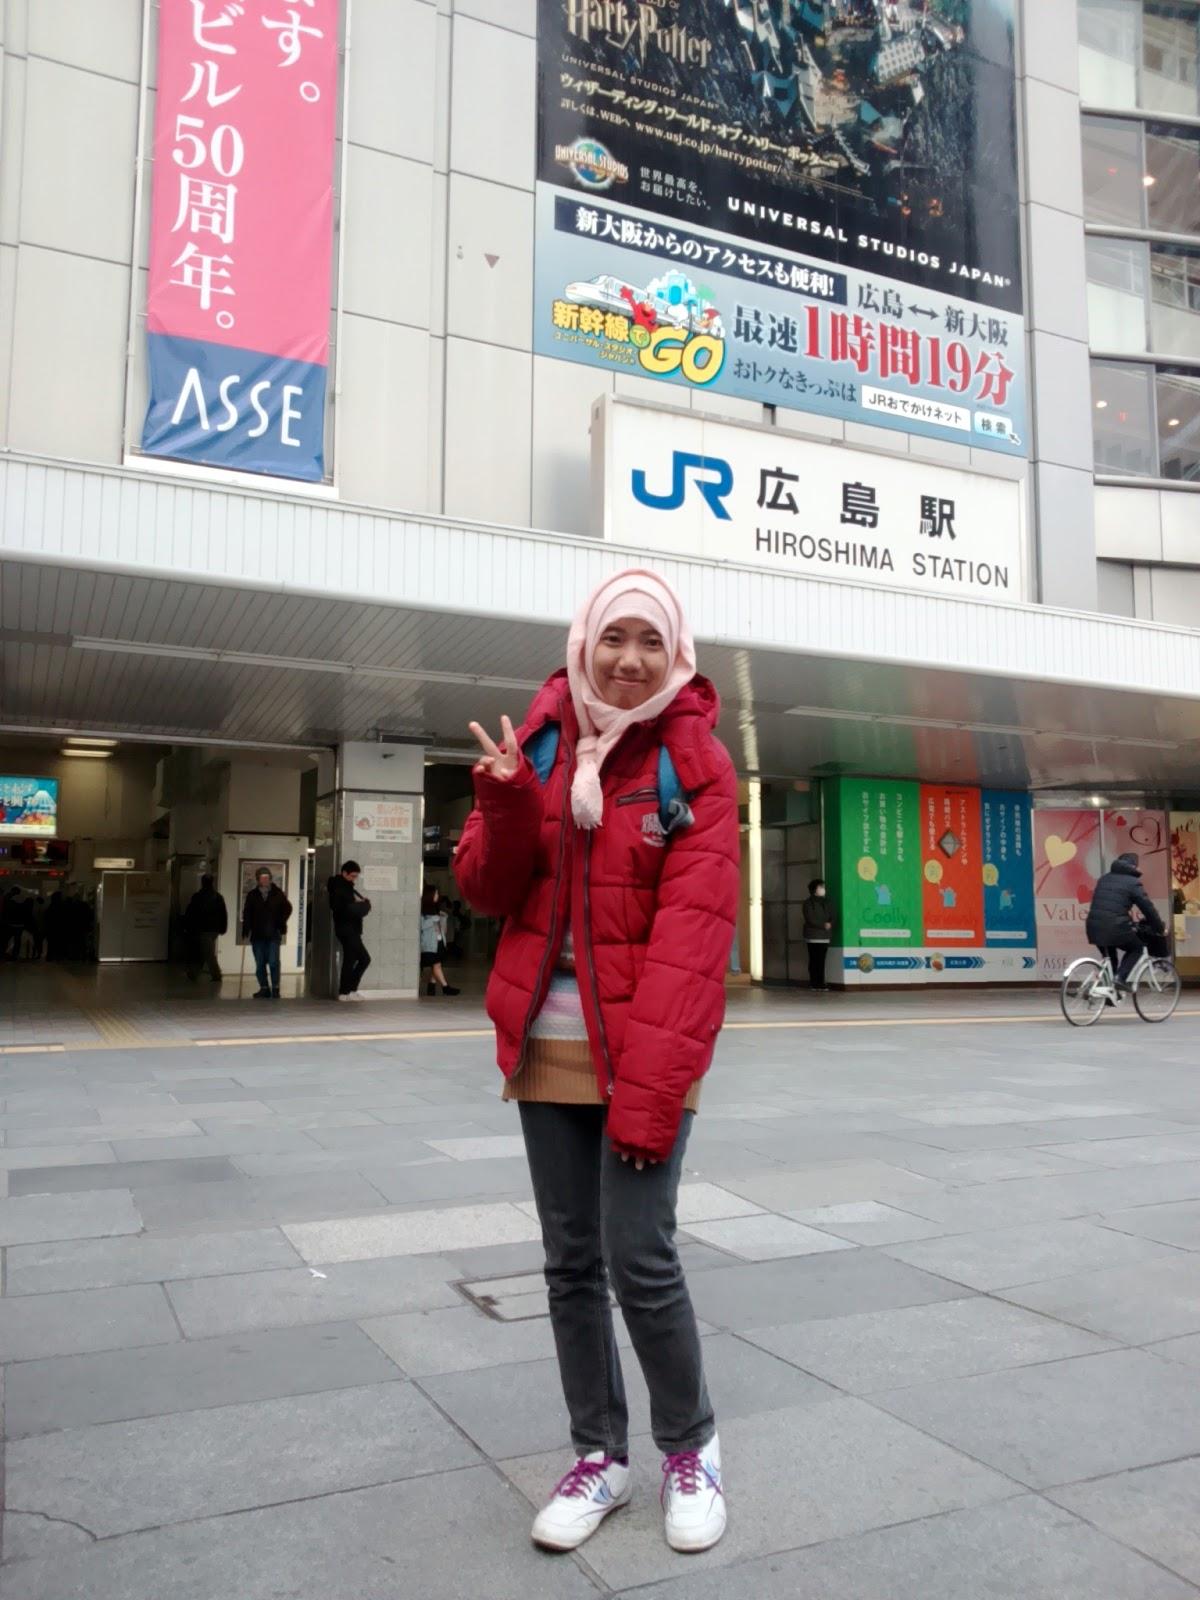 Hijapacker Februari 2017 Baju Tdr Frozen Mail Lpk Ini Adalah Jaket Yang Saya Beli Di Indonesia Pakai 3 Lapis Celana 2 Kaos Kaki T